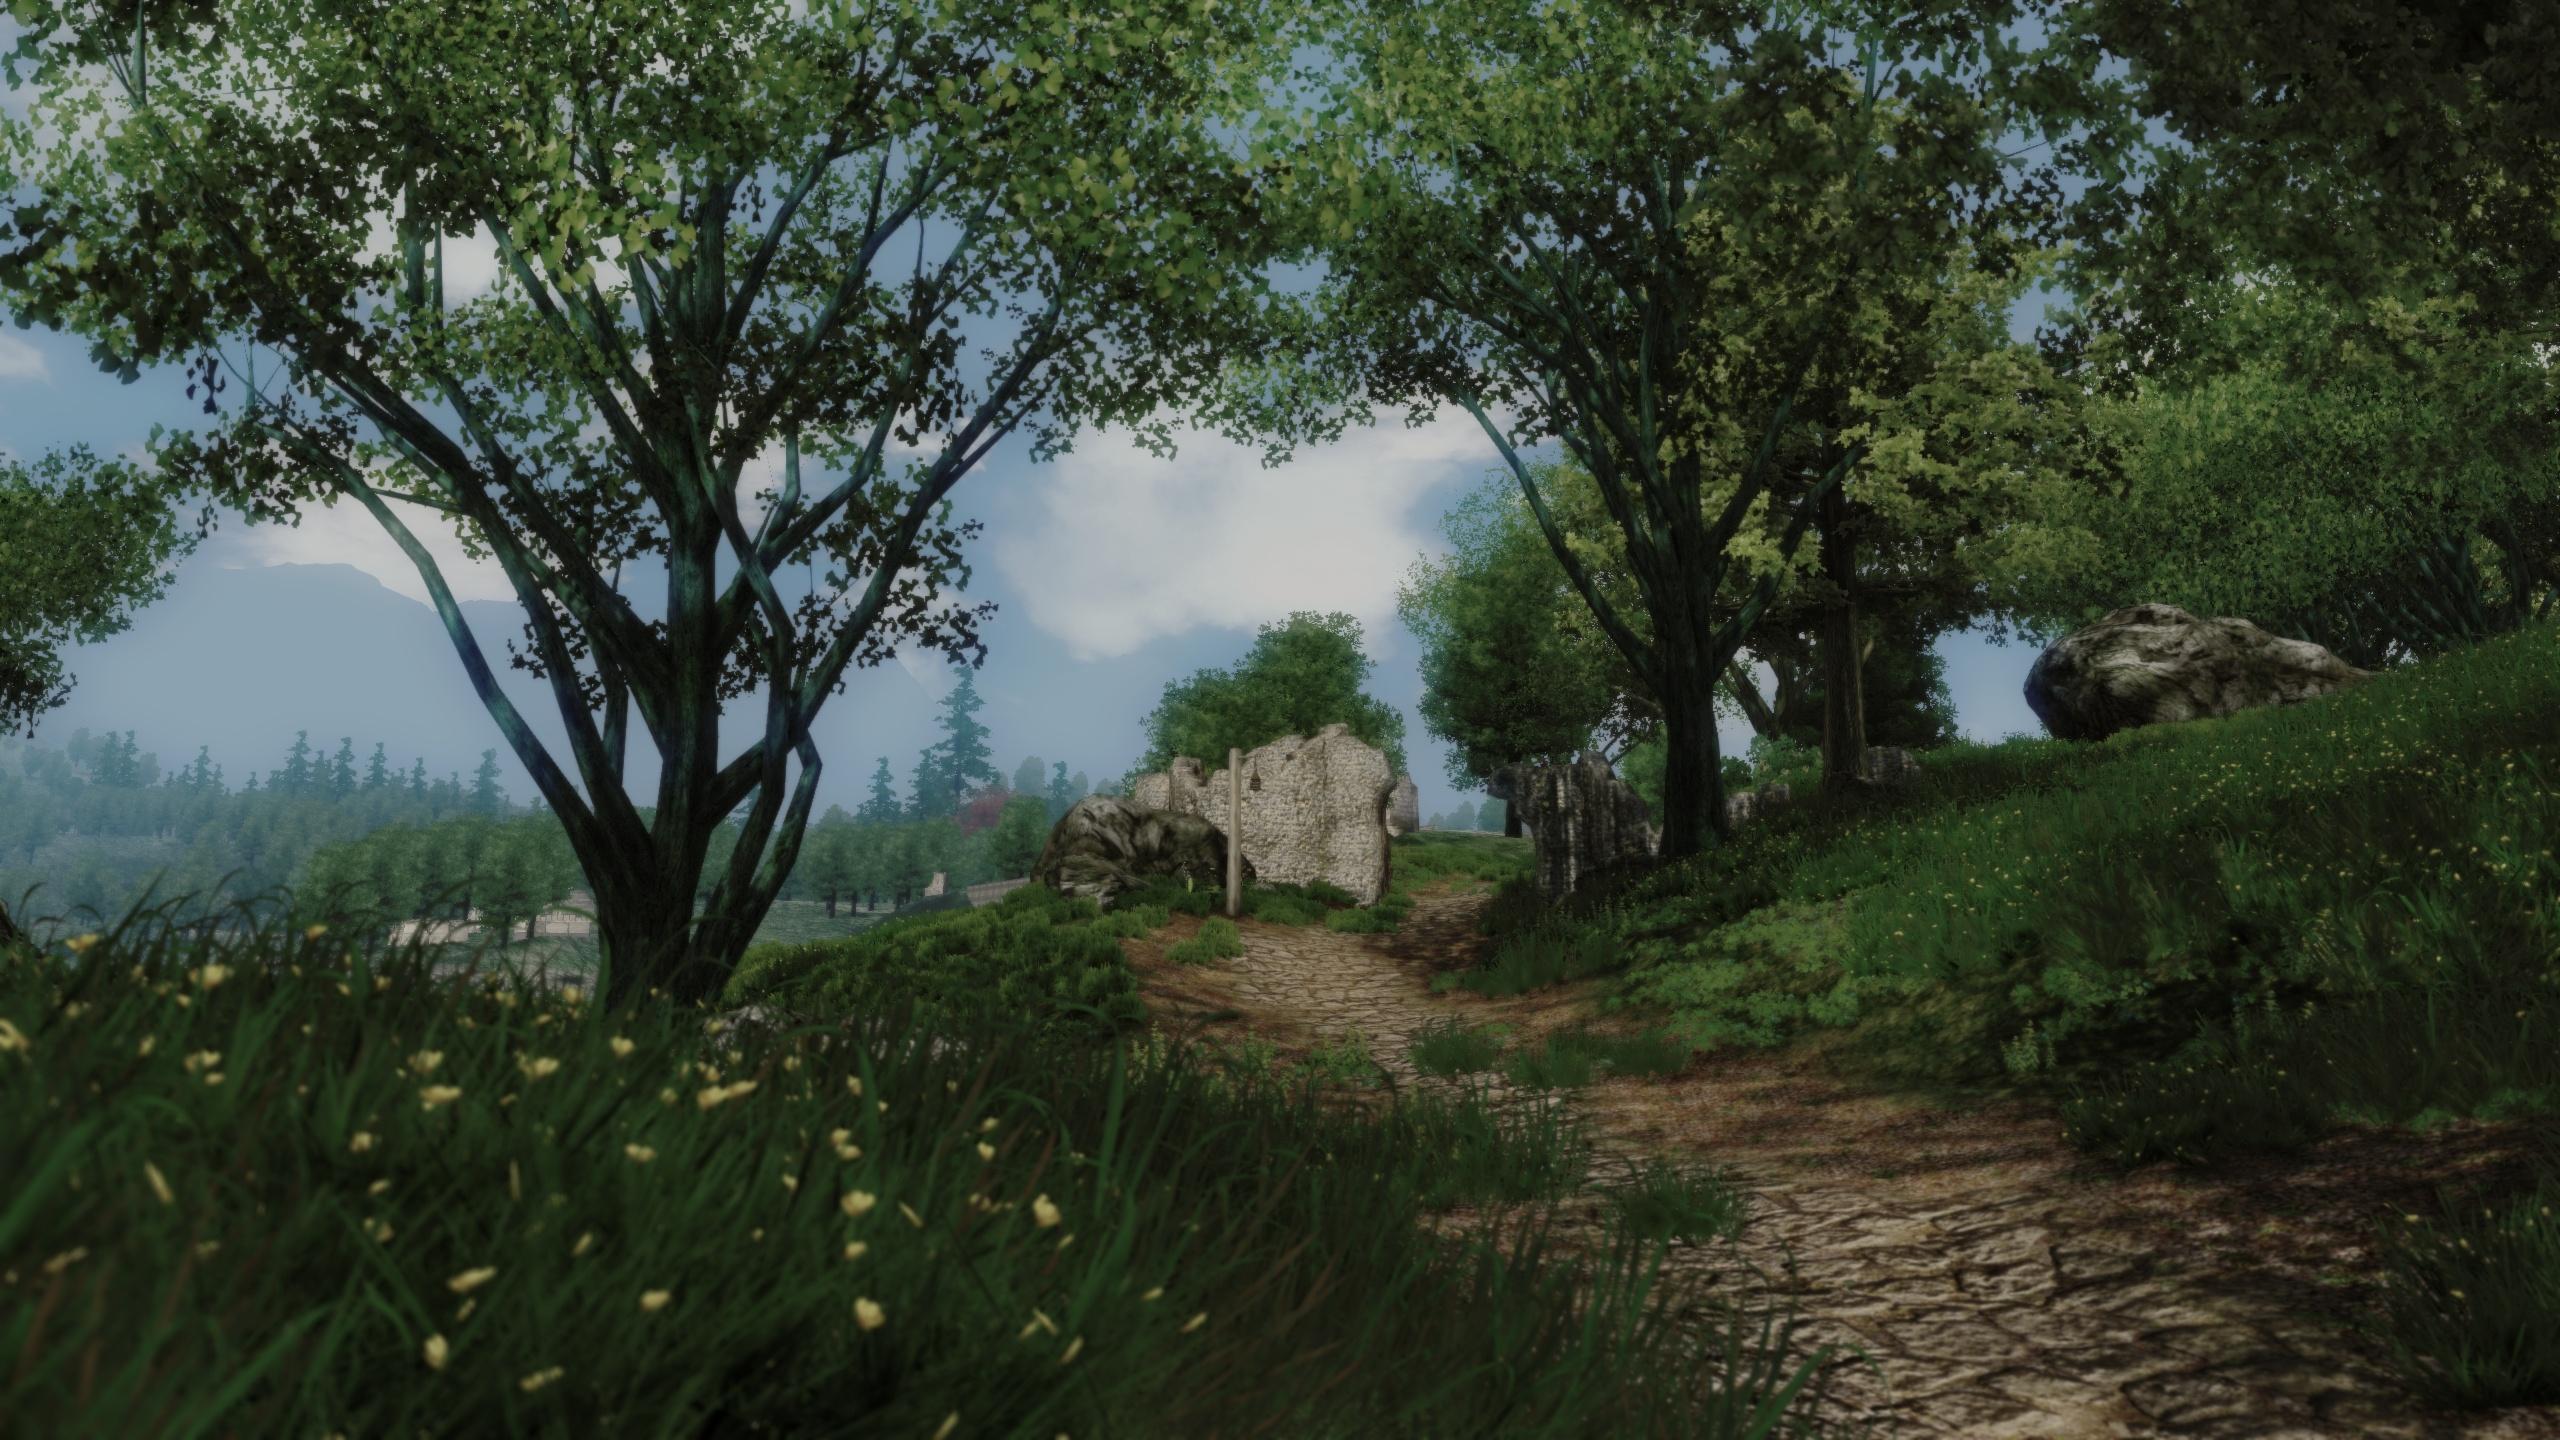 Oblivion Reloaded Hd Wallpaper Background Image 2560x1440 Id